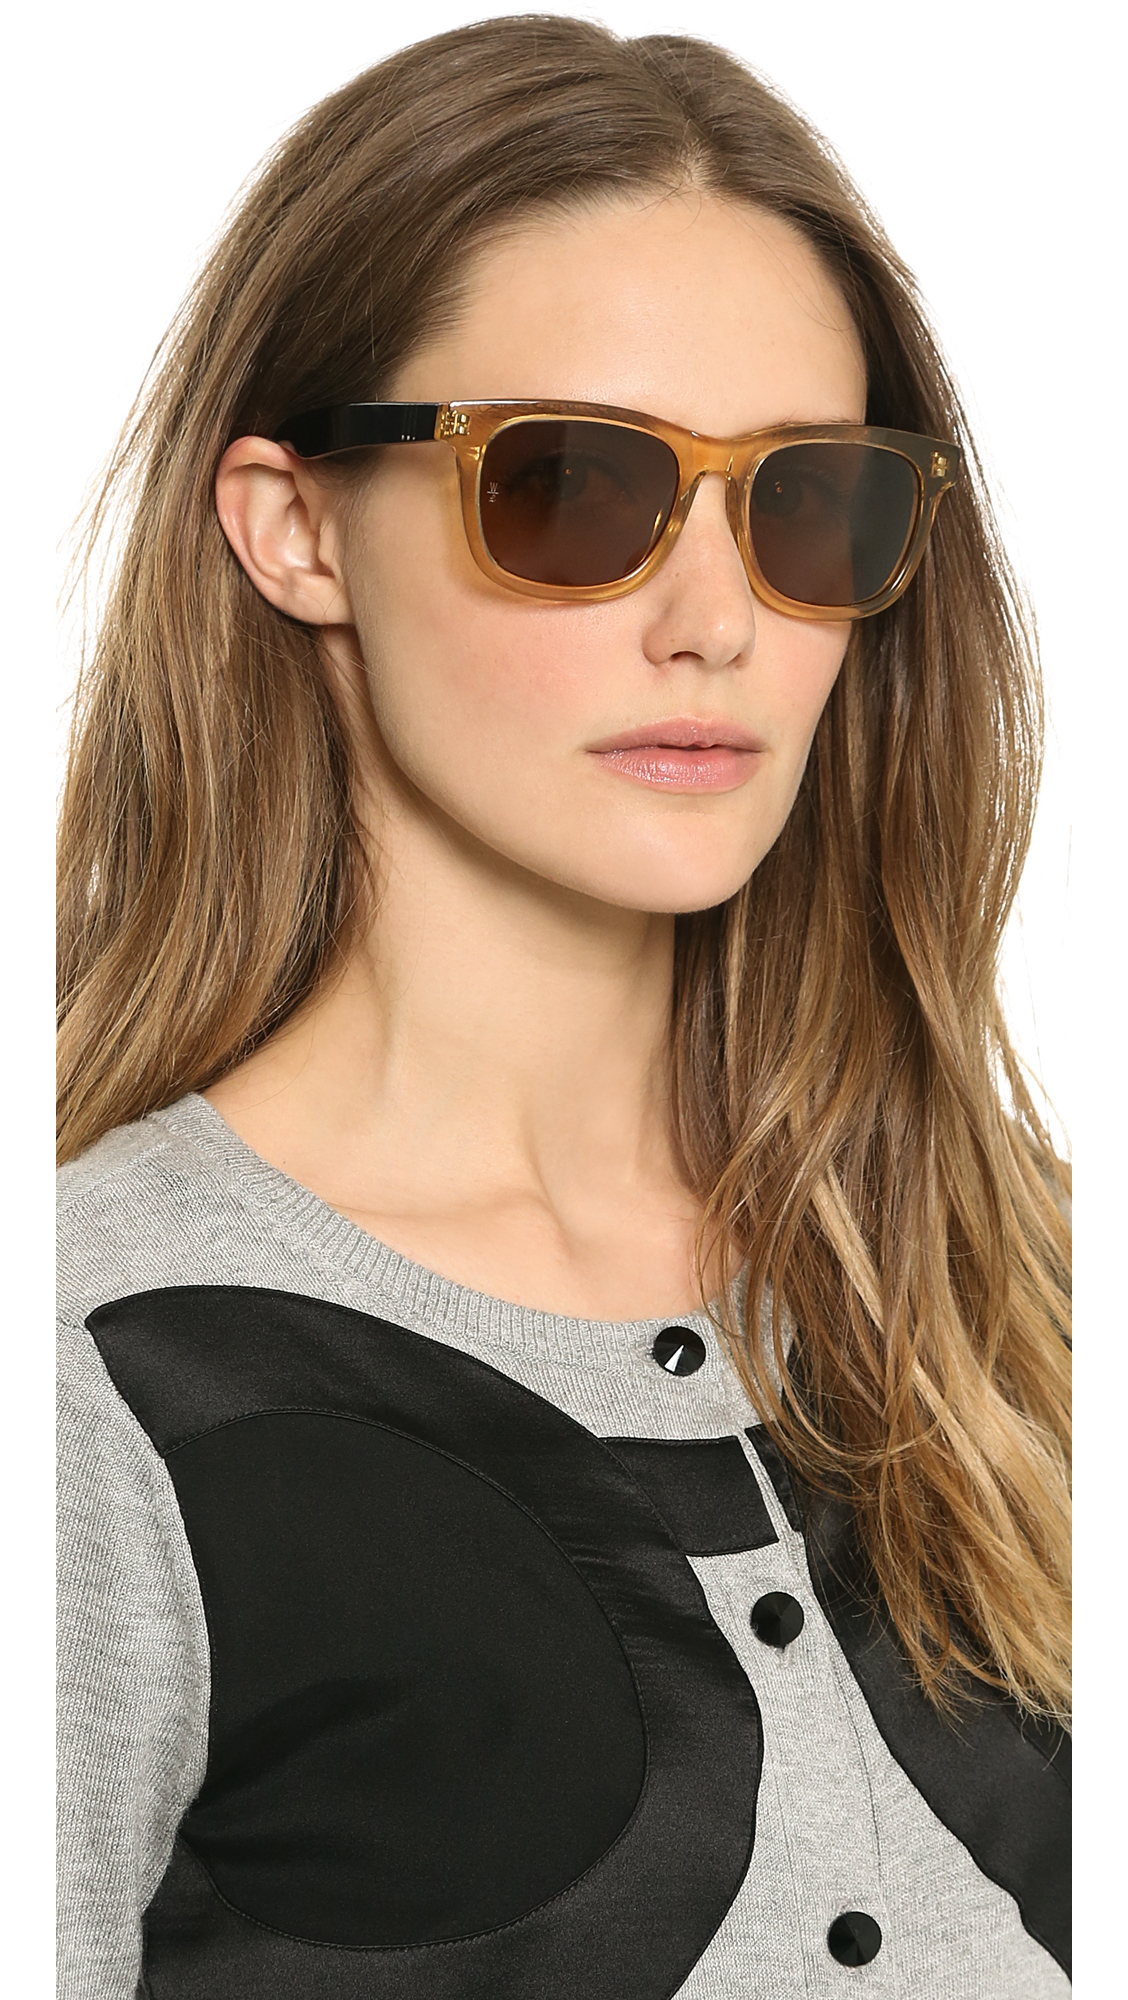 f0c3b9ad71c1 wonderland eyewear - eyewear near me